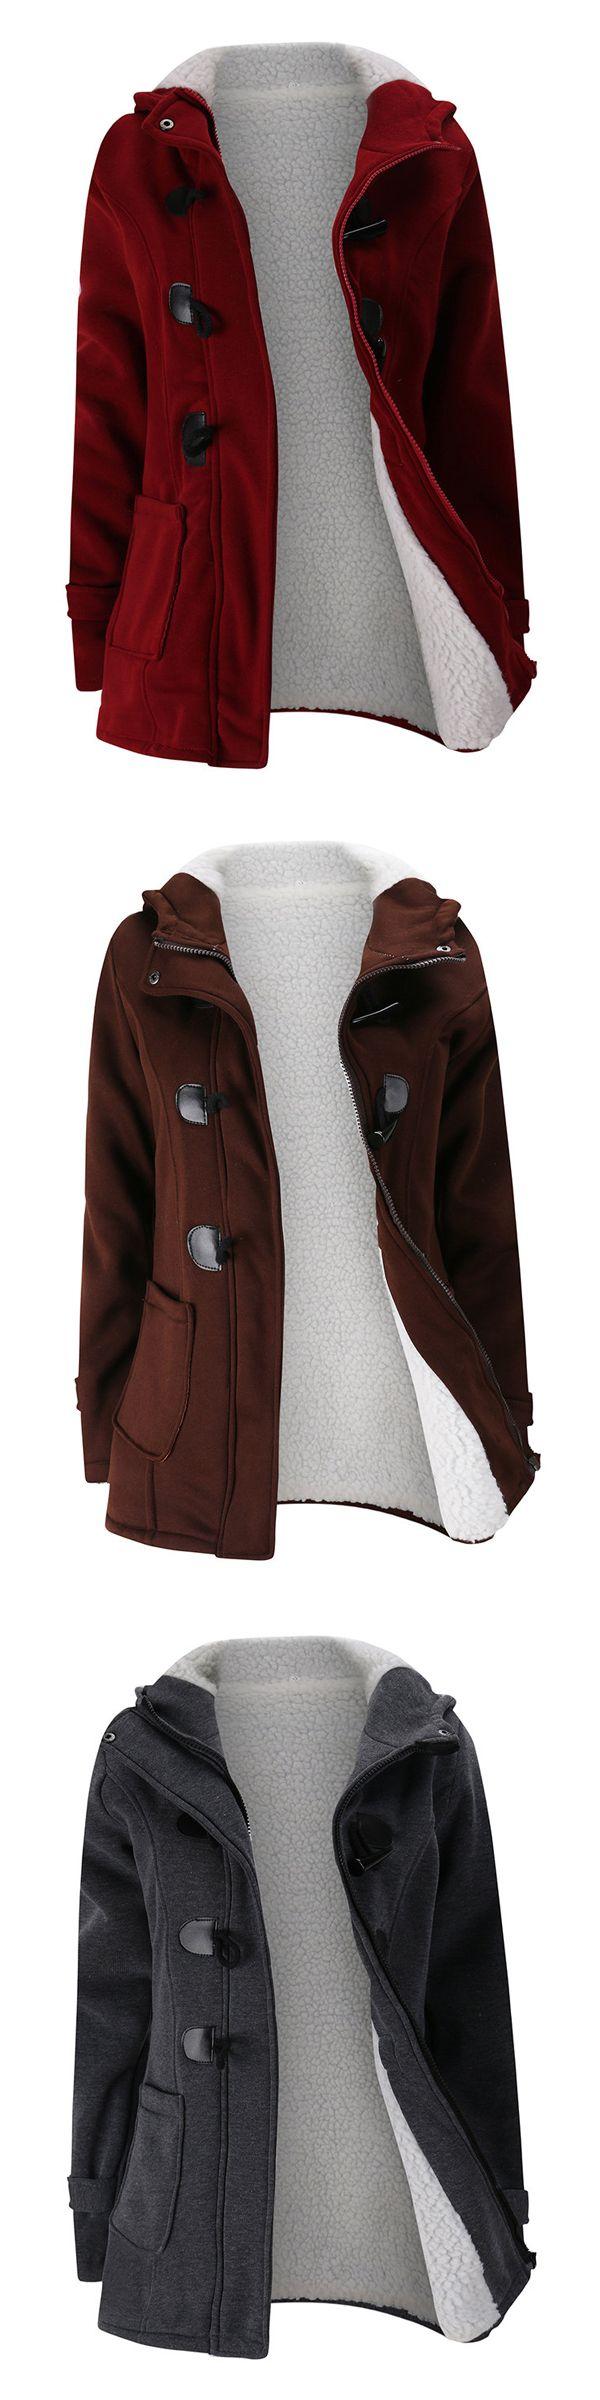 [Newchic Online Shopping] 47%OFF Women Thicken Coats